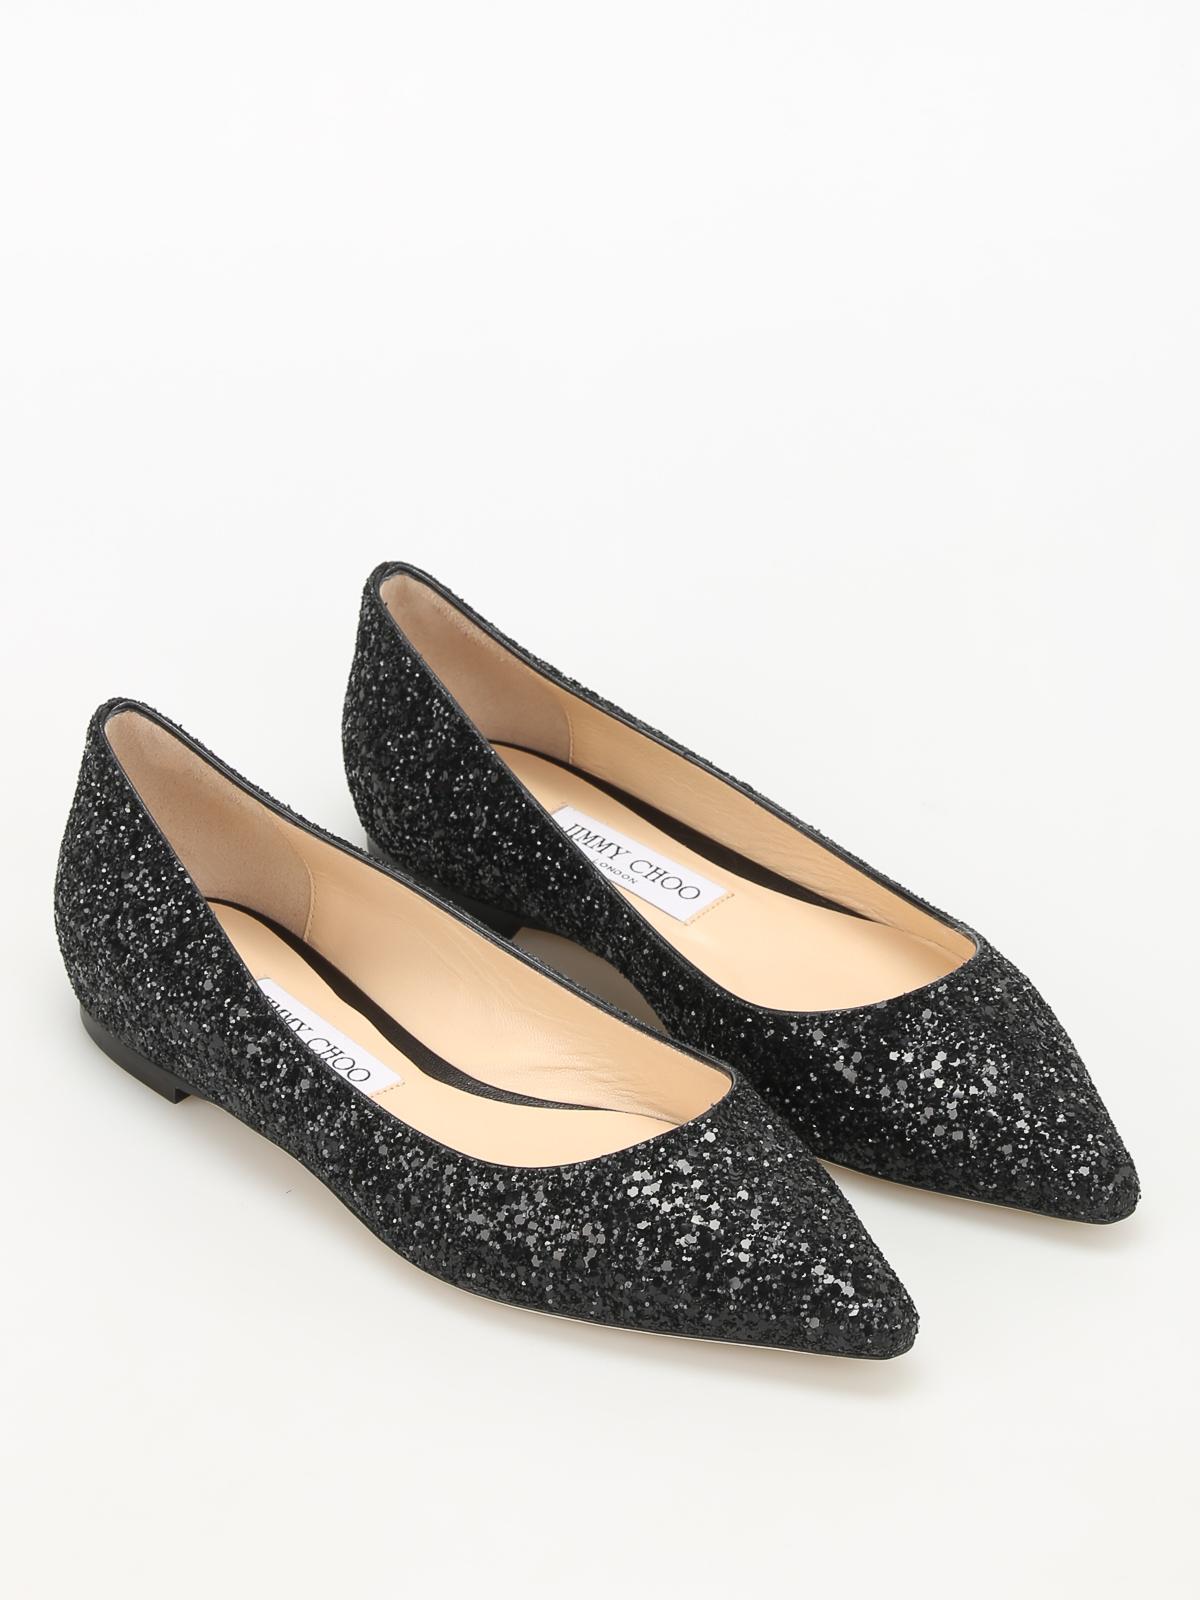 2f2798c5e970 Jimmy Choo - Romy faded glitter ballerinas - flat shoes - ROMY FLAT ...